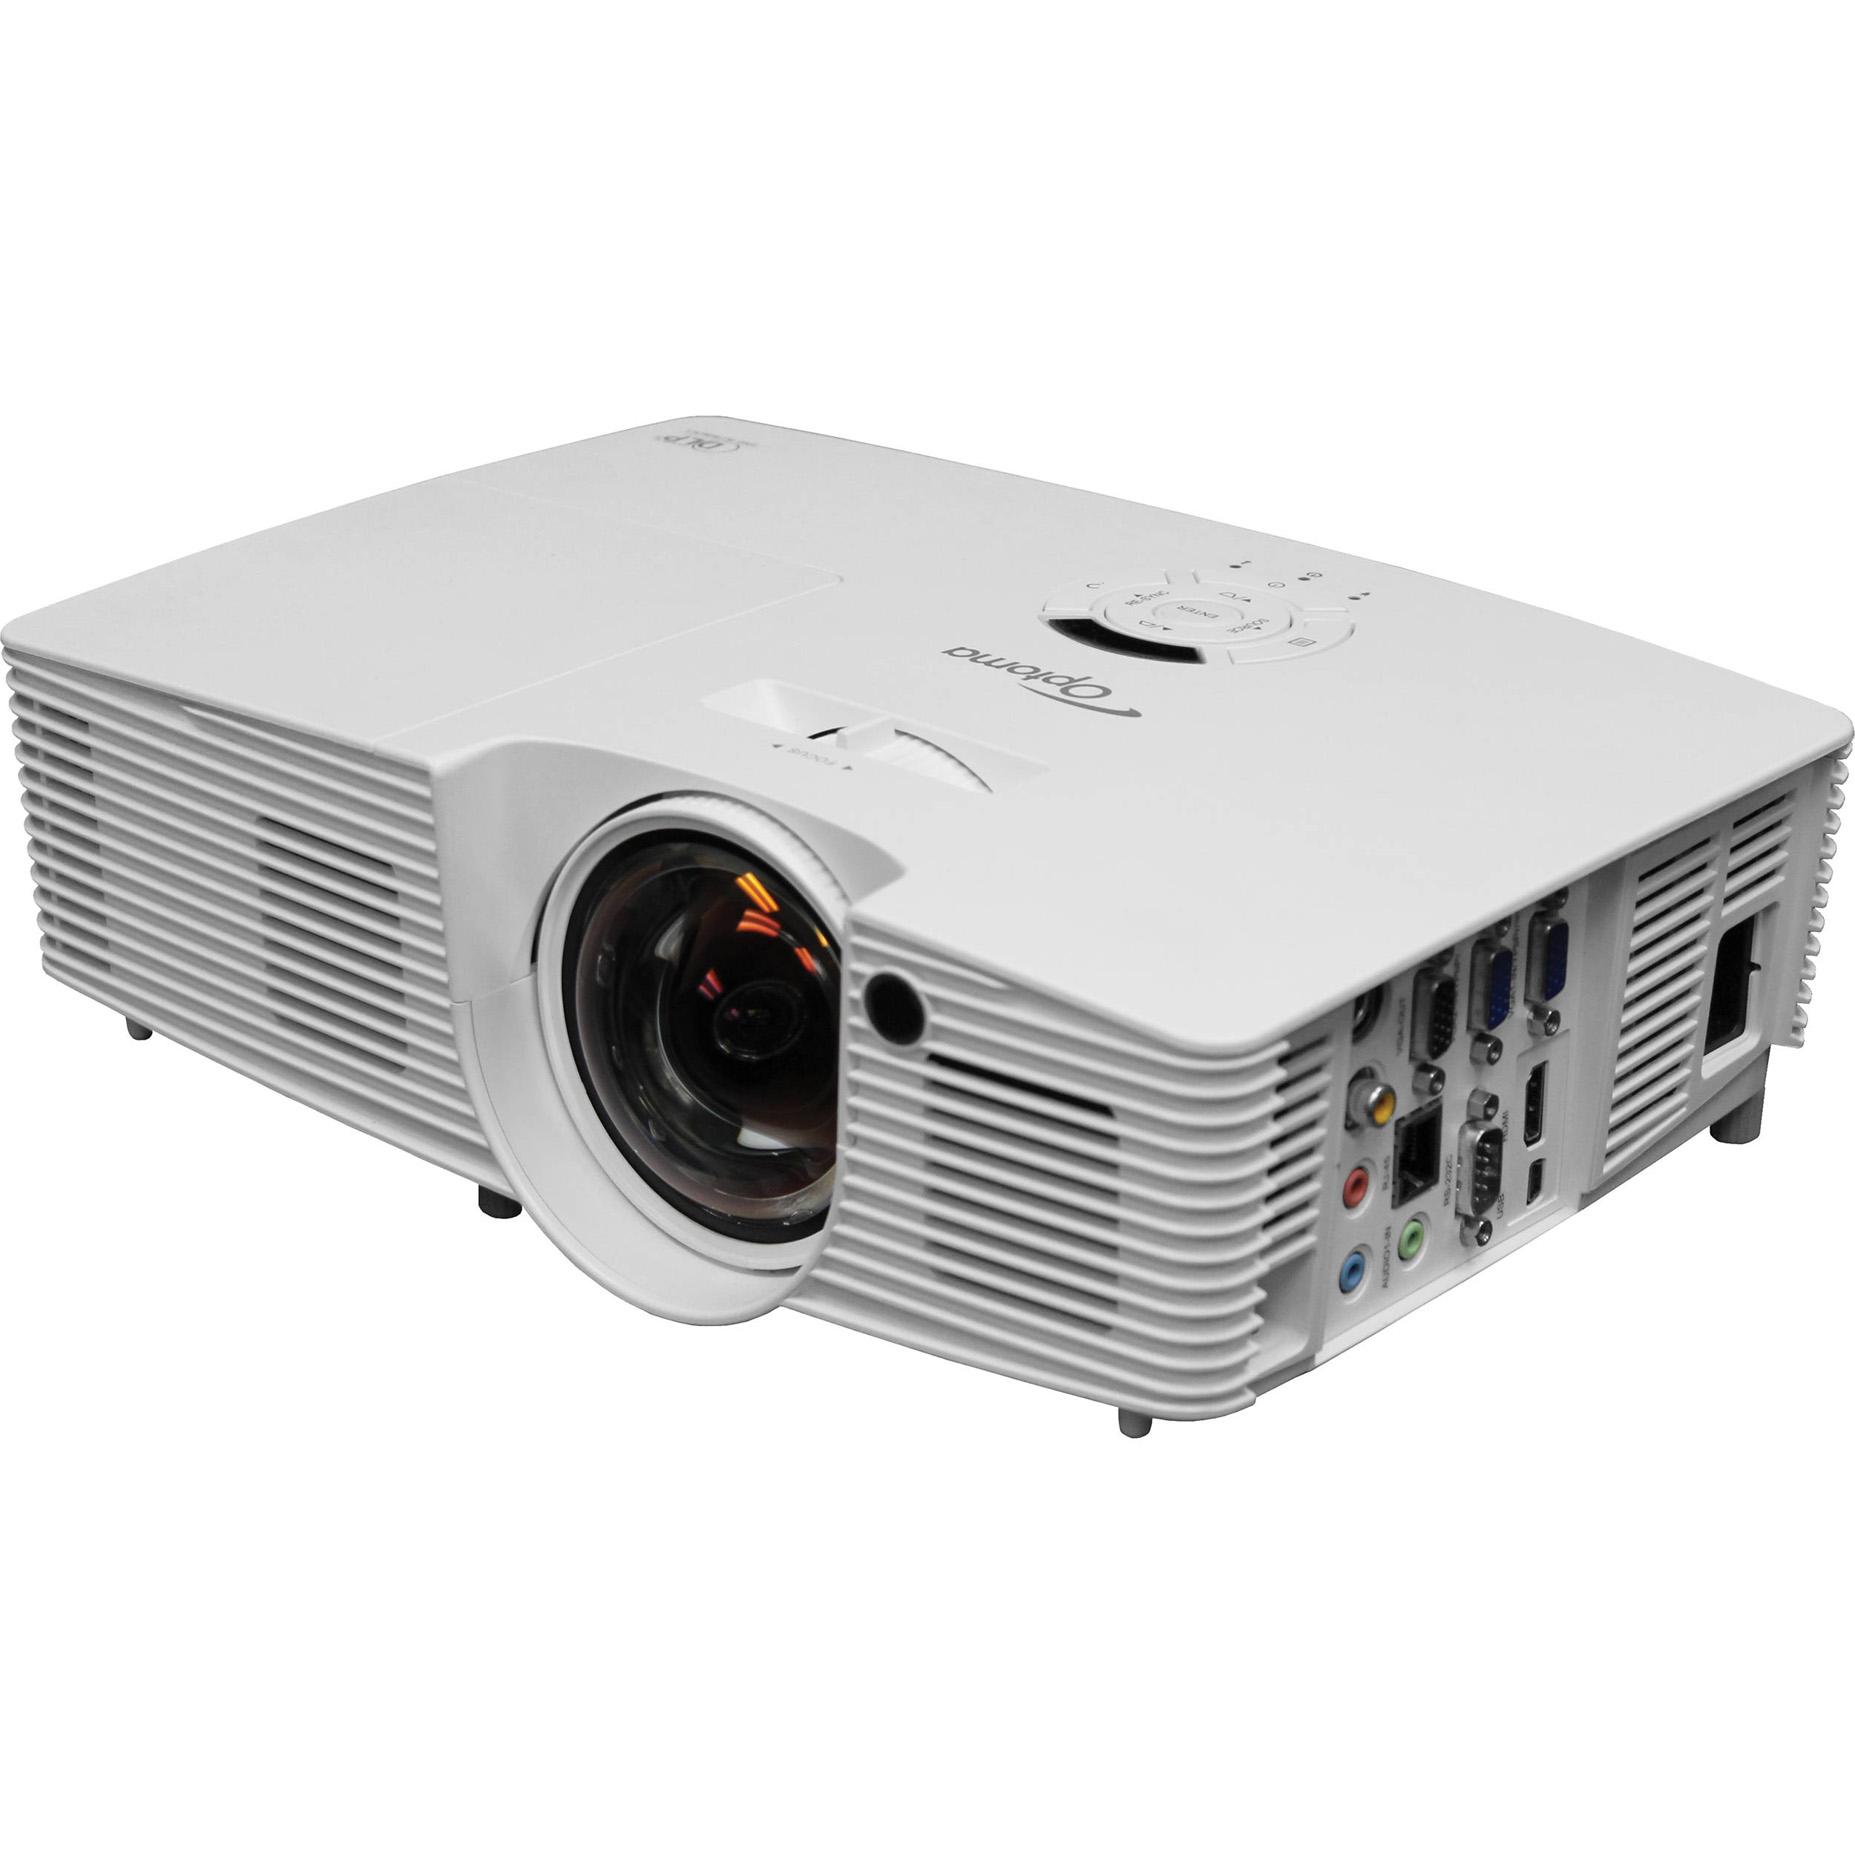 Optoma Dlp Projector Type X312 3200 Ansi Lumens Xga Hitam Daftar Cus In224 Svga Hdmi Spesifikasi X316st 3400